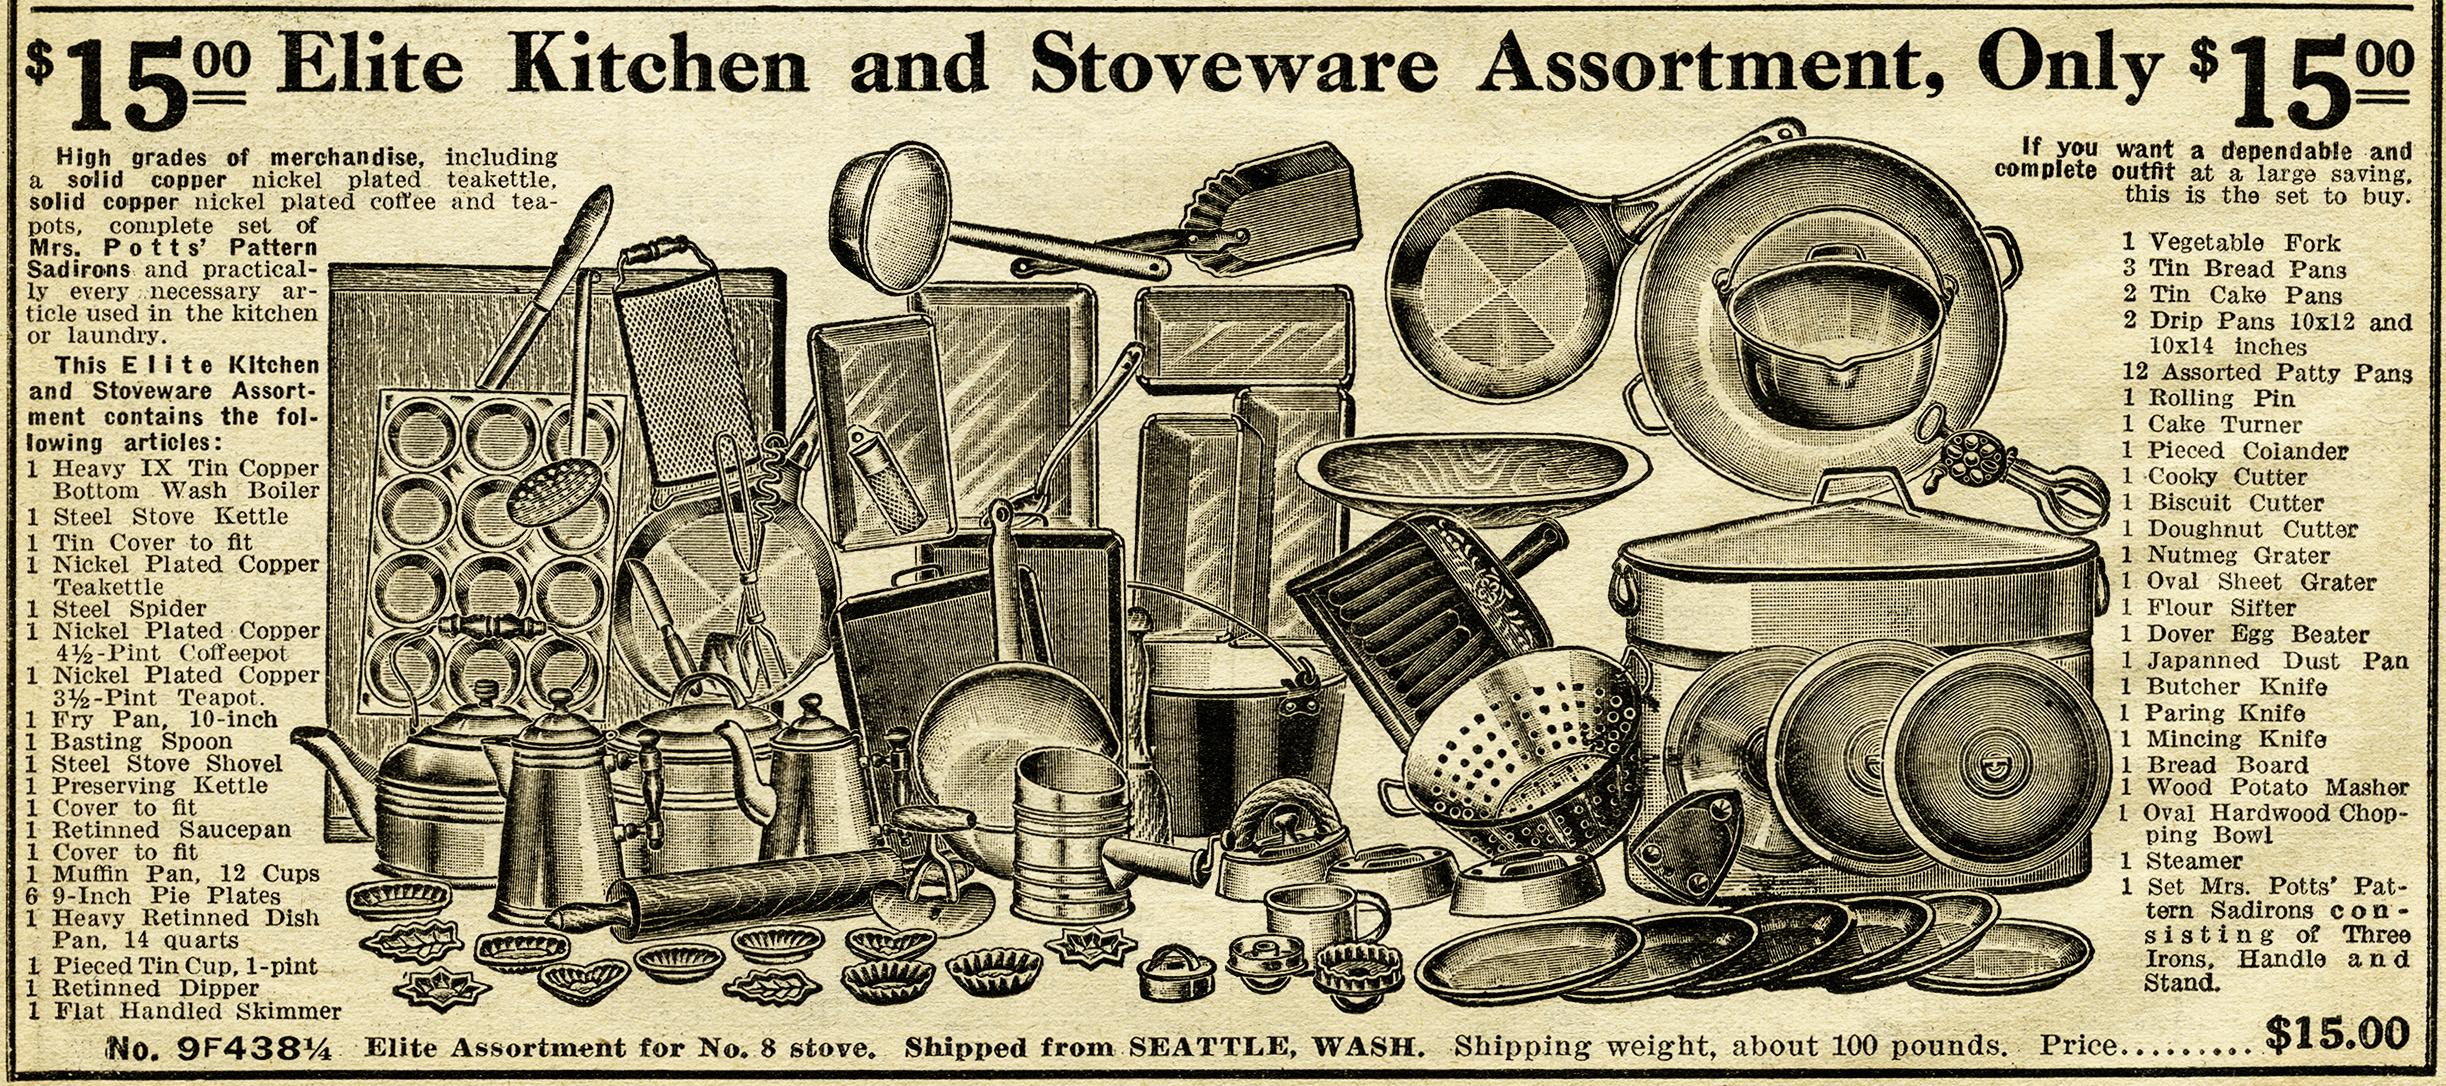 Antique Kitchen Stoveware Assortment ~ Free Catalogue Ad ...